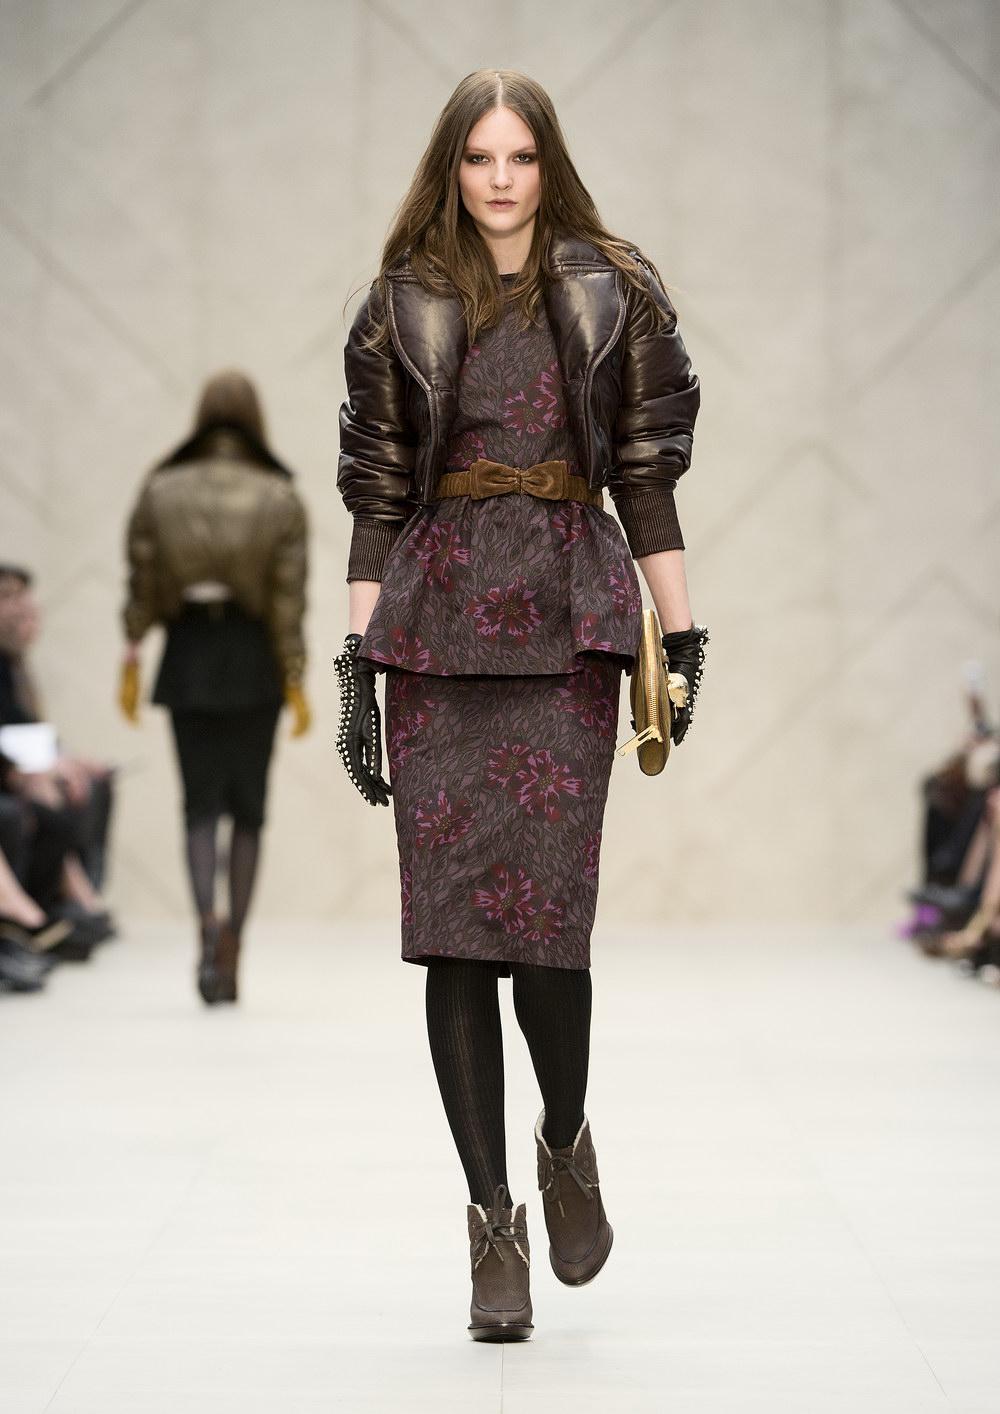 Burberry Prorsum Runway London Fashion Week Aw14: RUNWAY: Burberry Prorsum Autumn Winter 2012.13 Womenswear